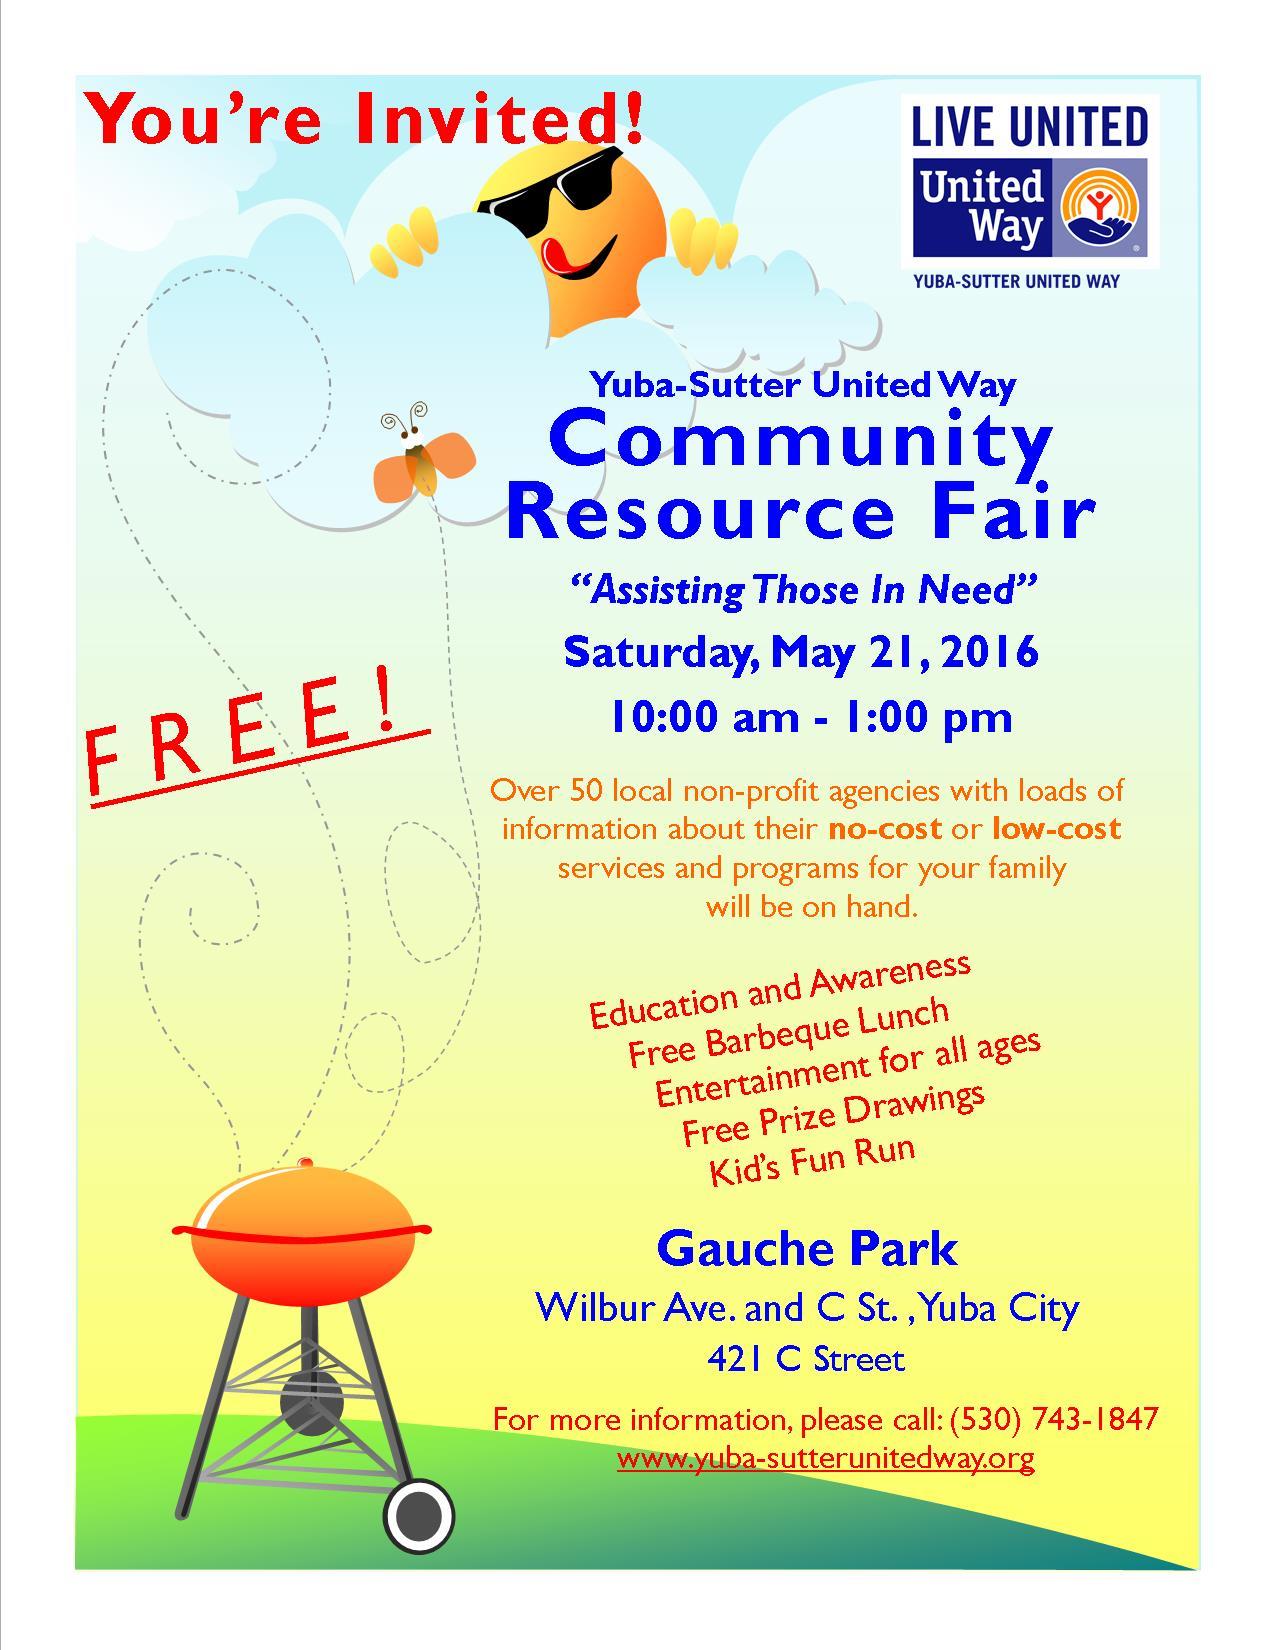 Community Resource Fair Flyer 2016